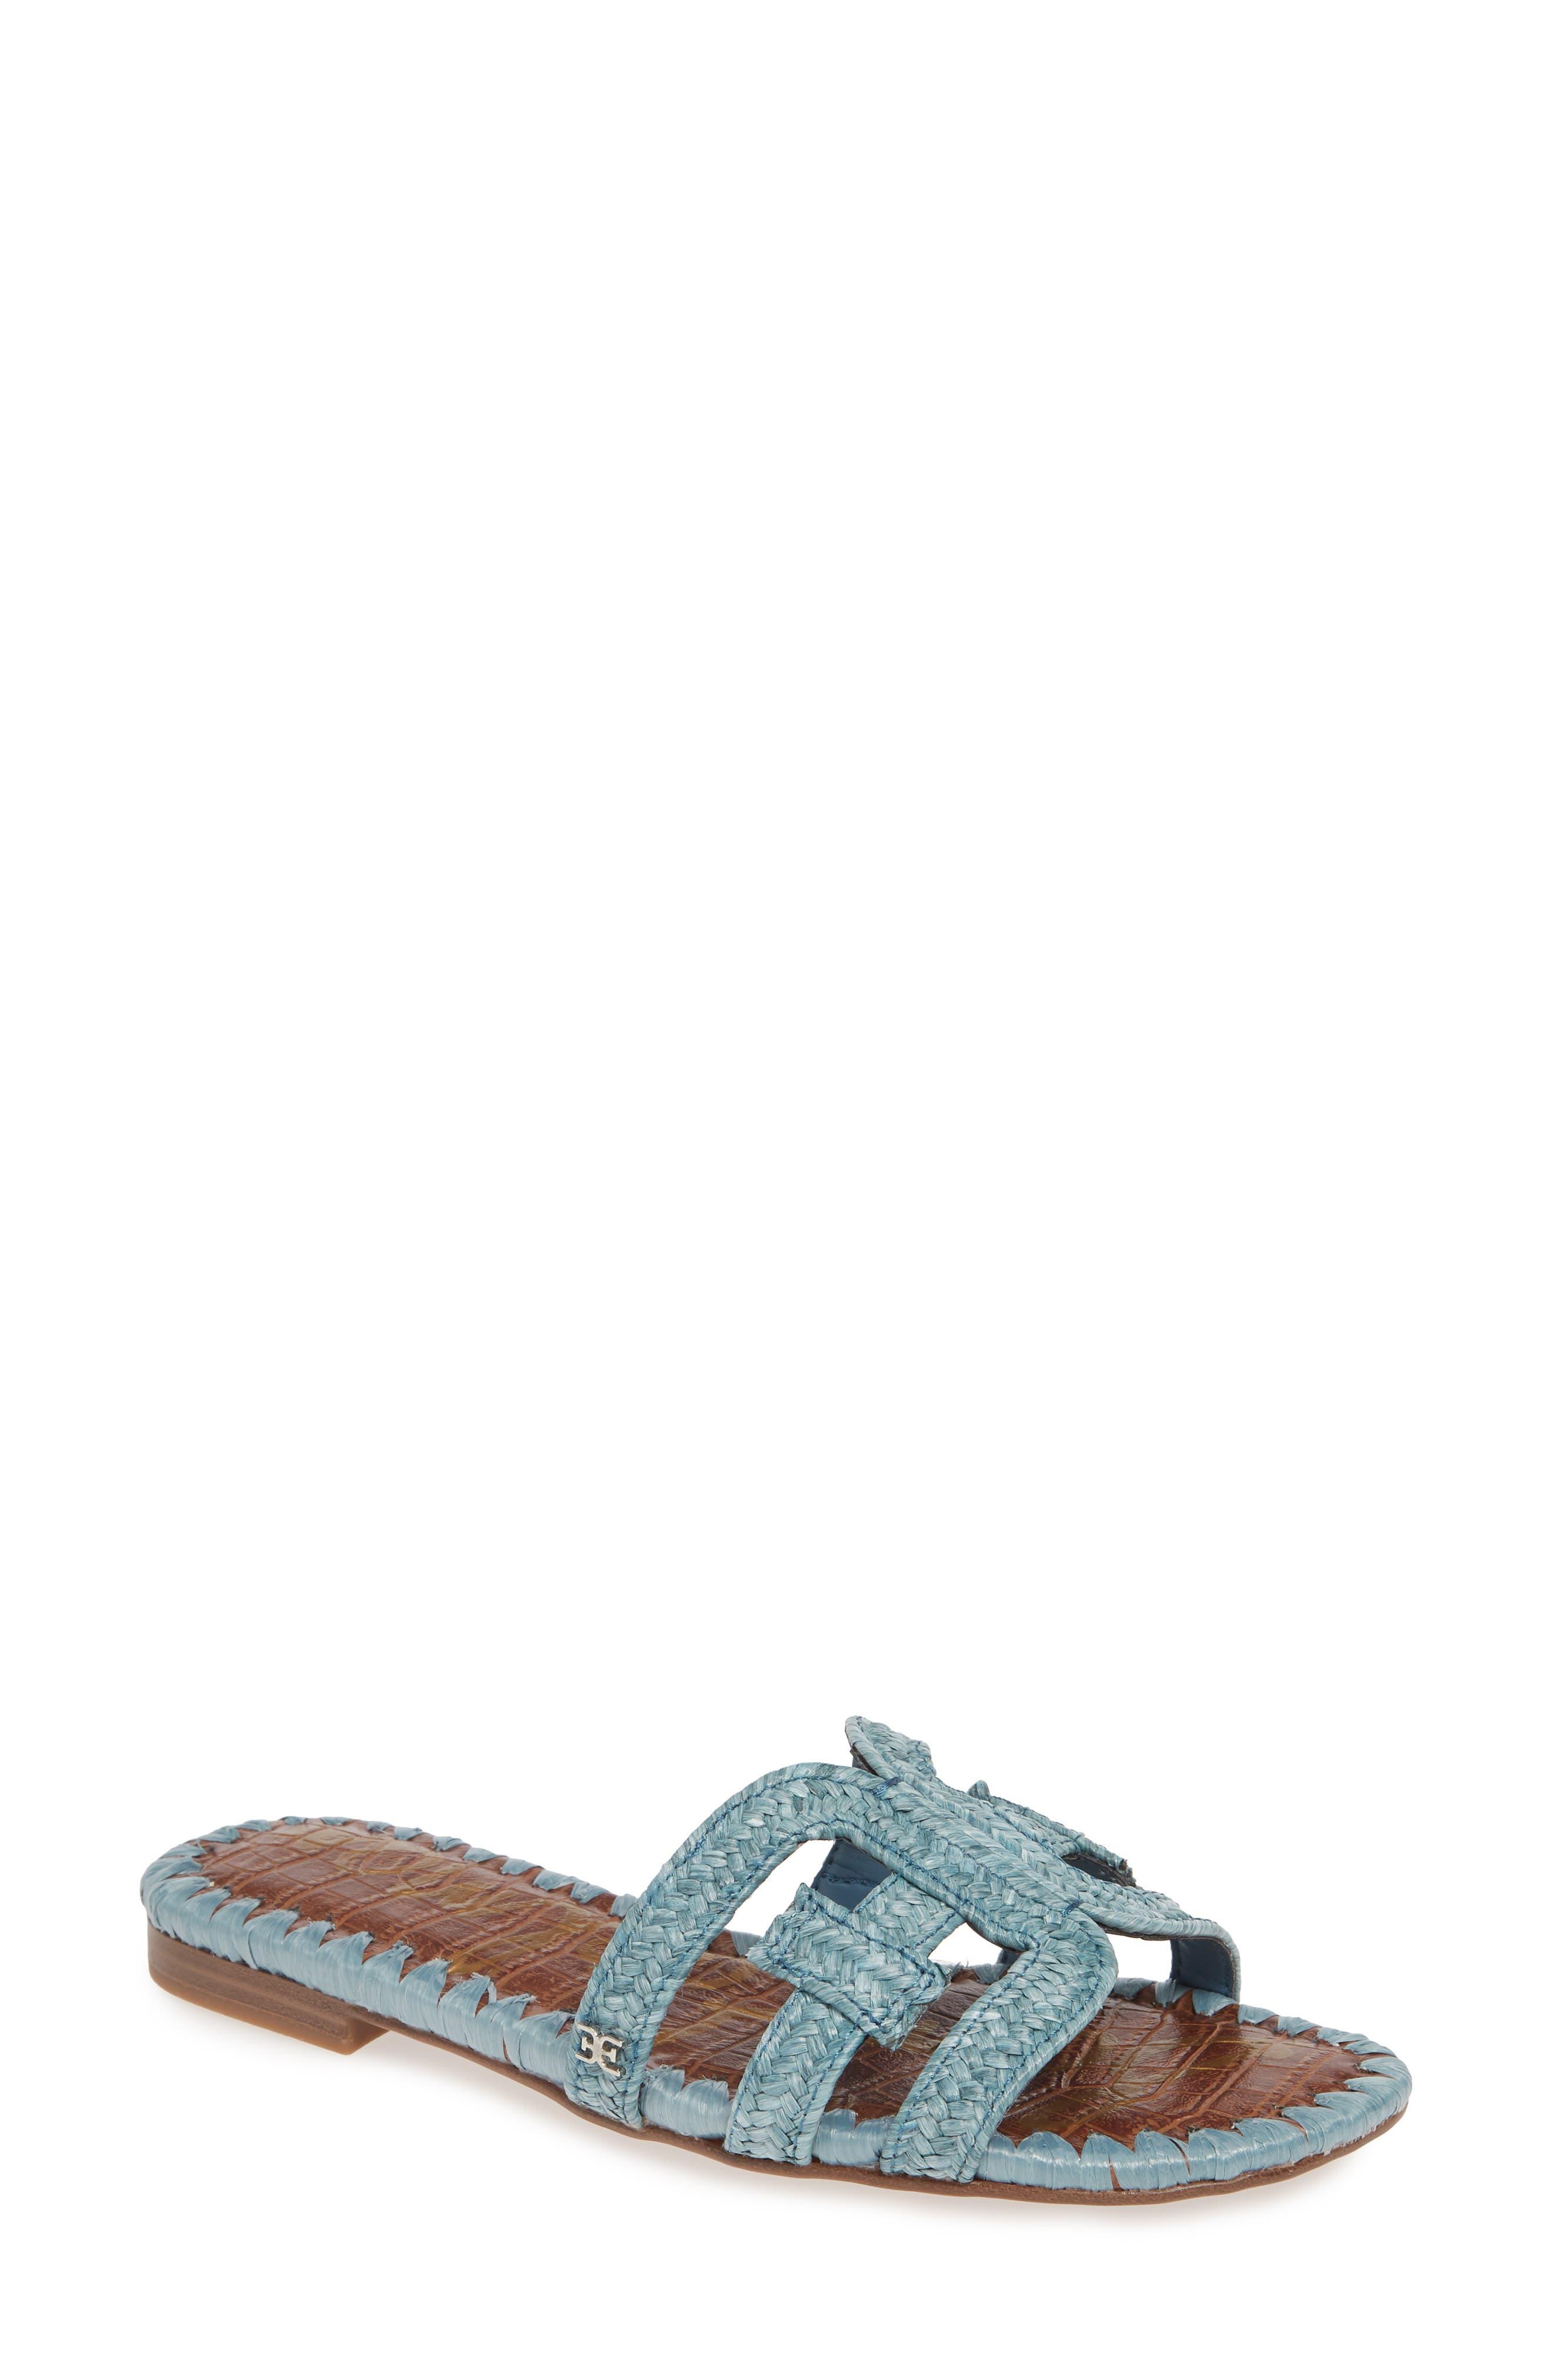 Sam Edelman Beckie Slide Sandal, Blue